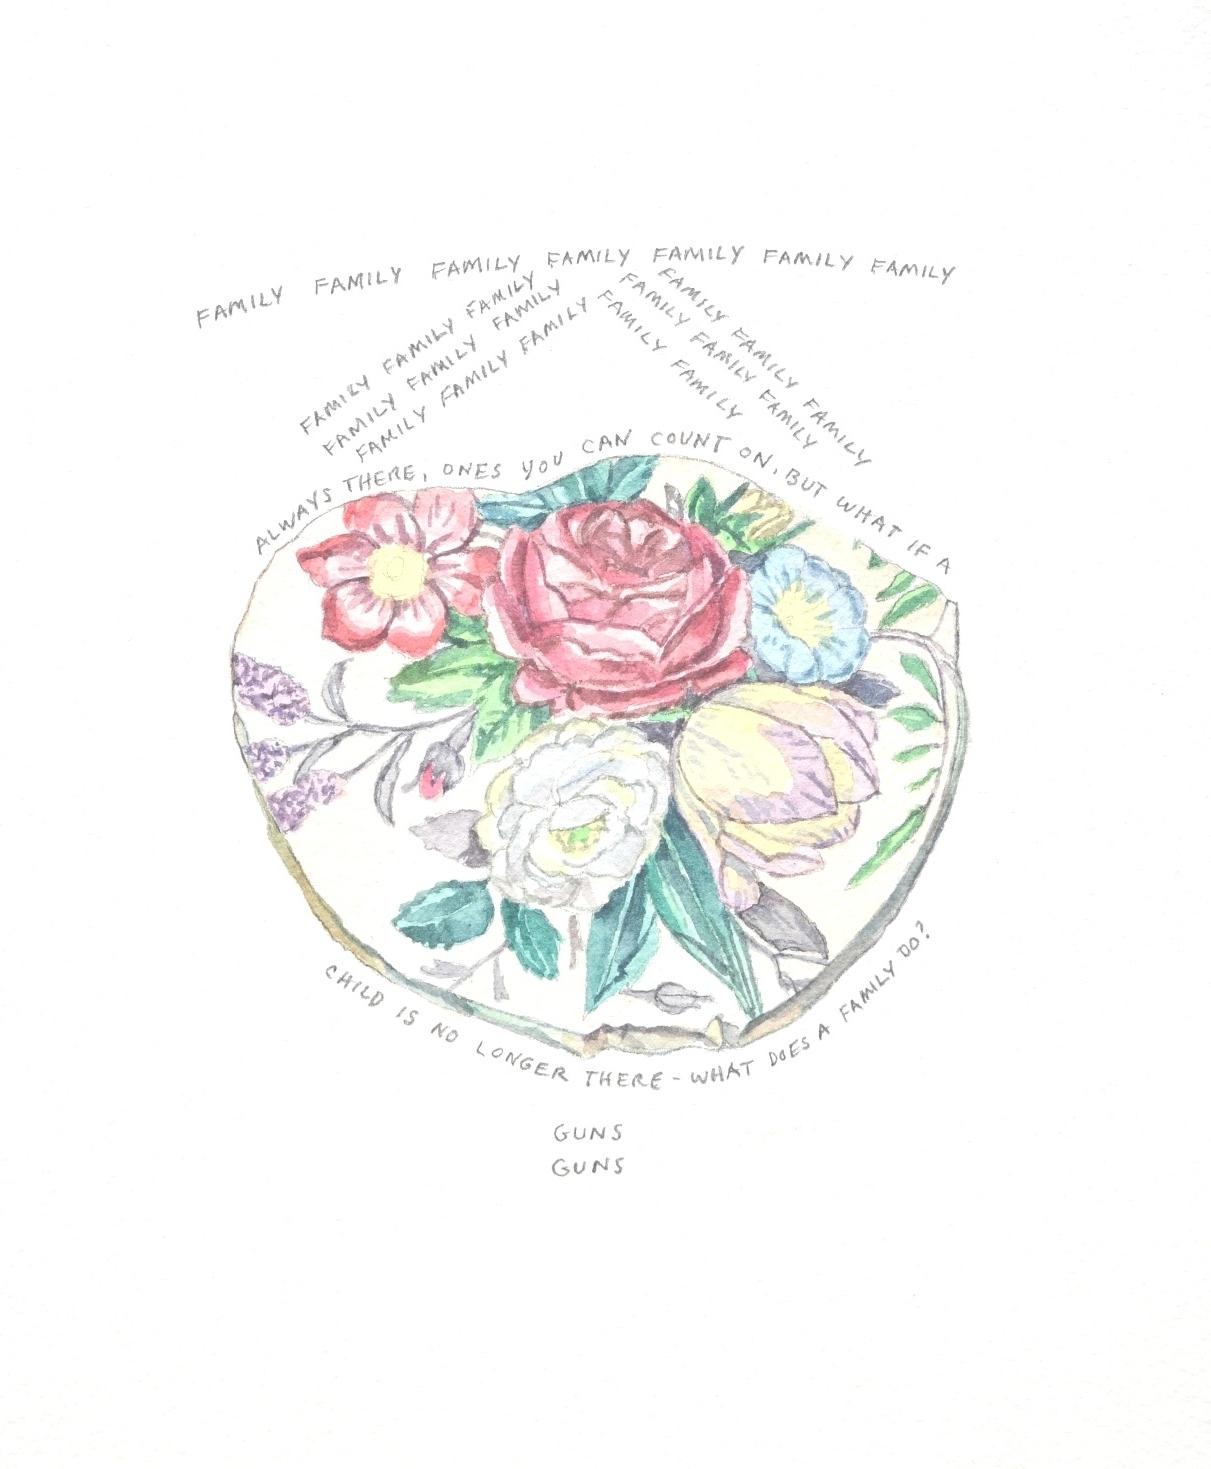 S. Sutro, Gun Series - Family, watercolor+text, 12x11, 2014.JPG